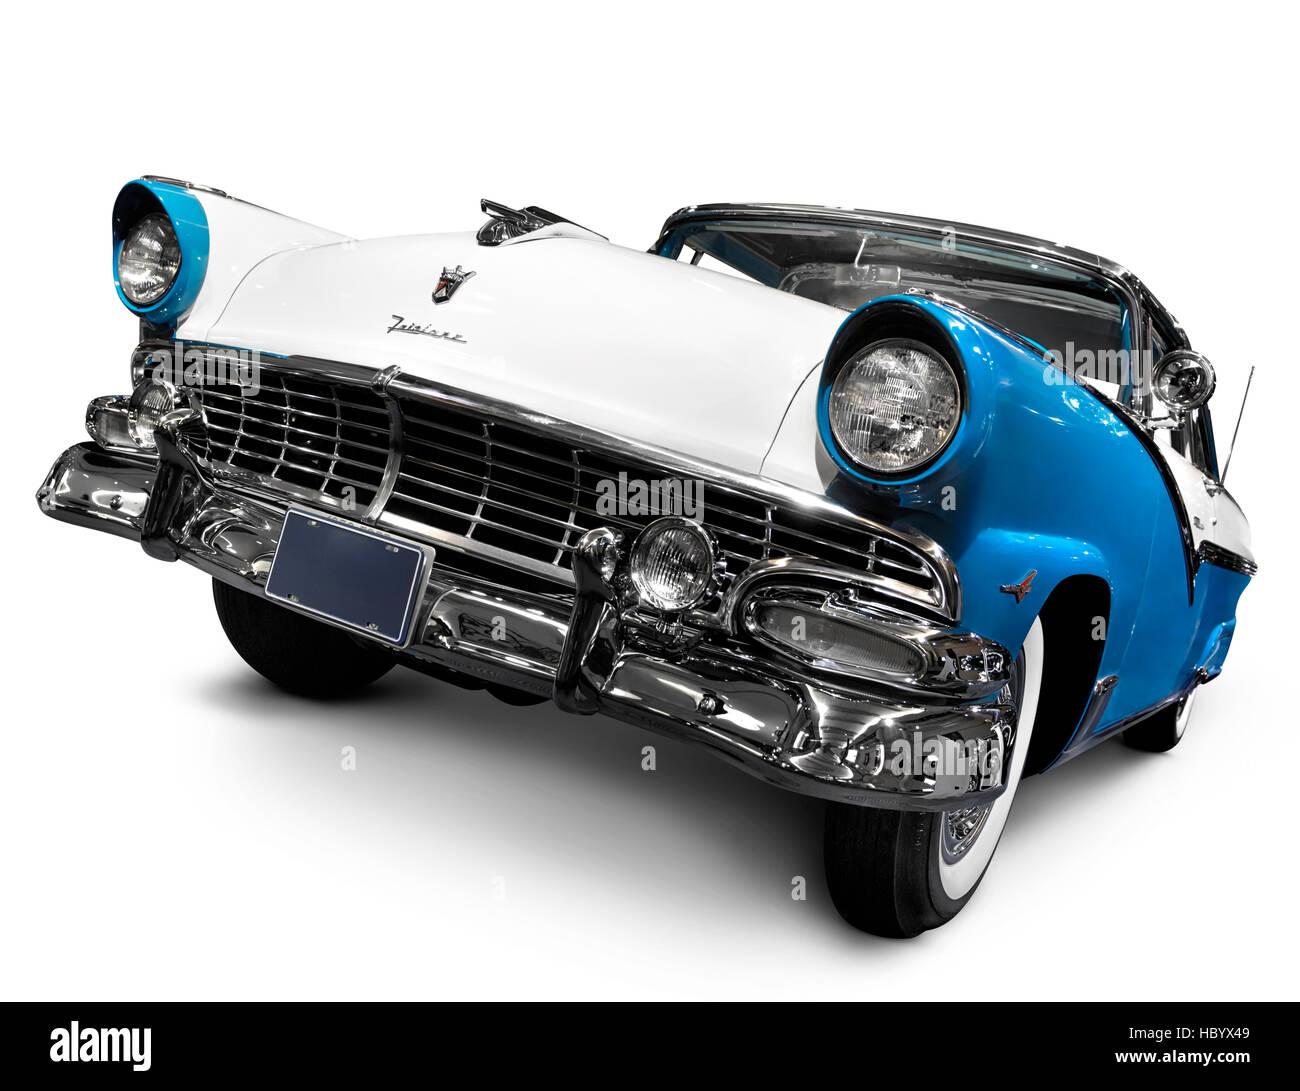 Türkis blaue Krone Victoria Skyliner 1956 Glasstop Vicky Retro-Oldtimer von Ford Motor Company, auch genannt Stockbild